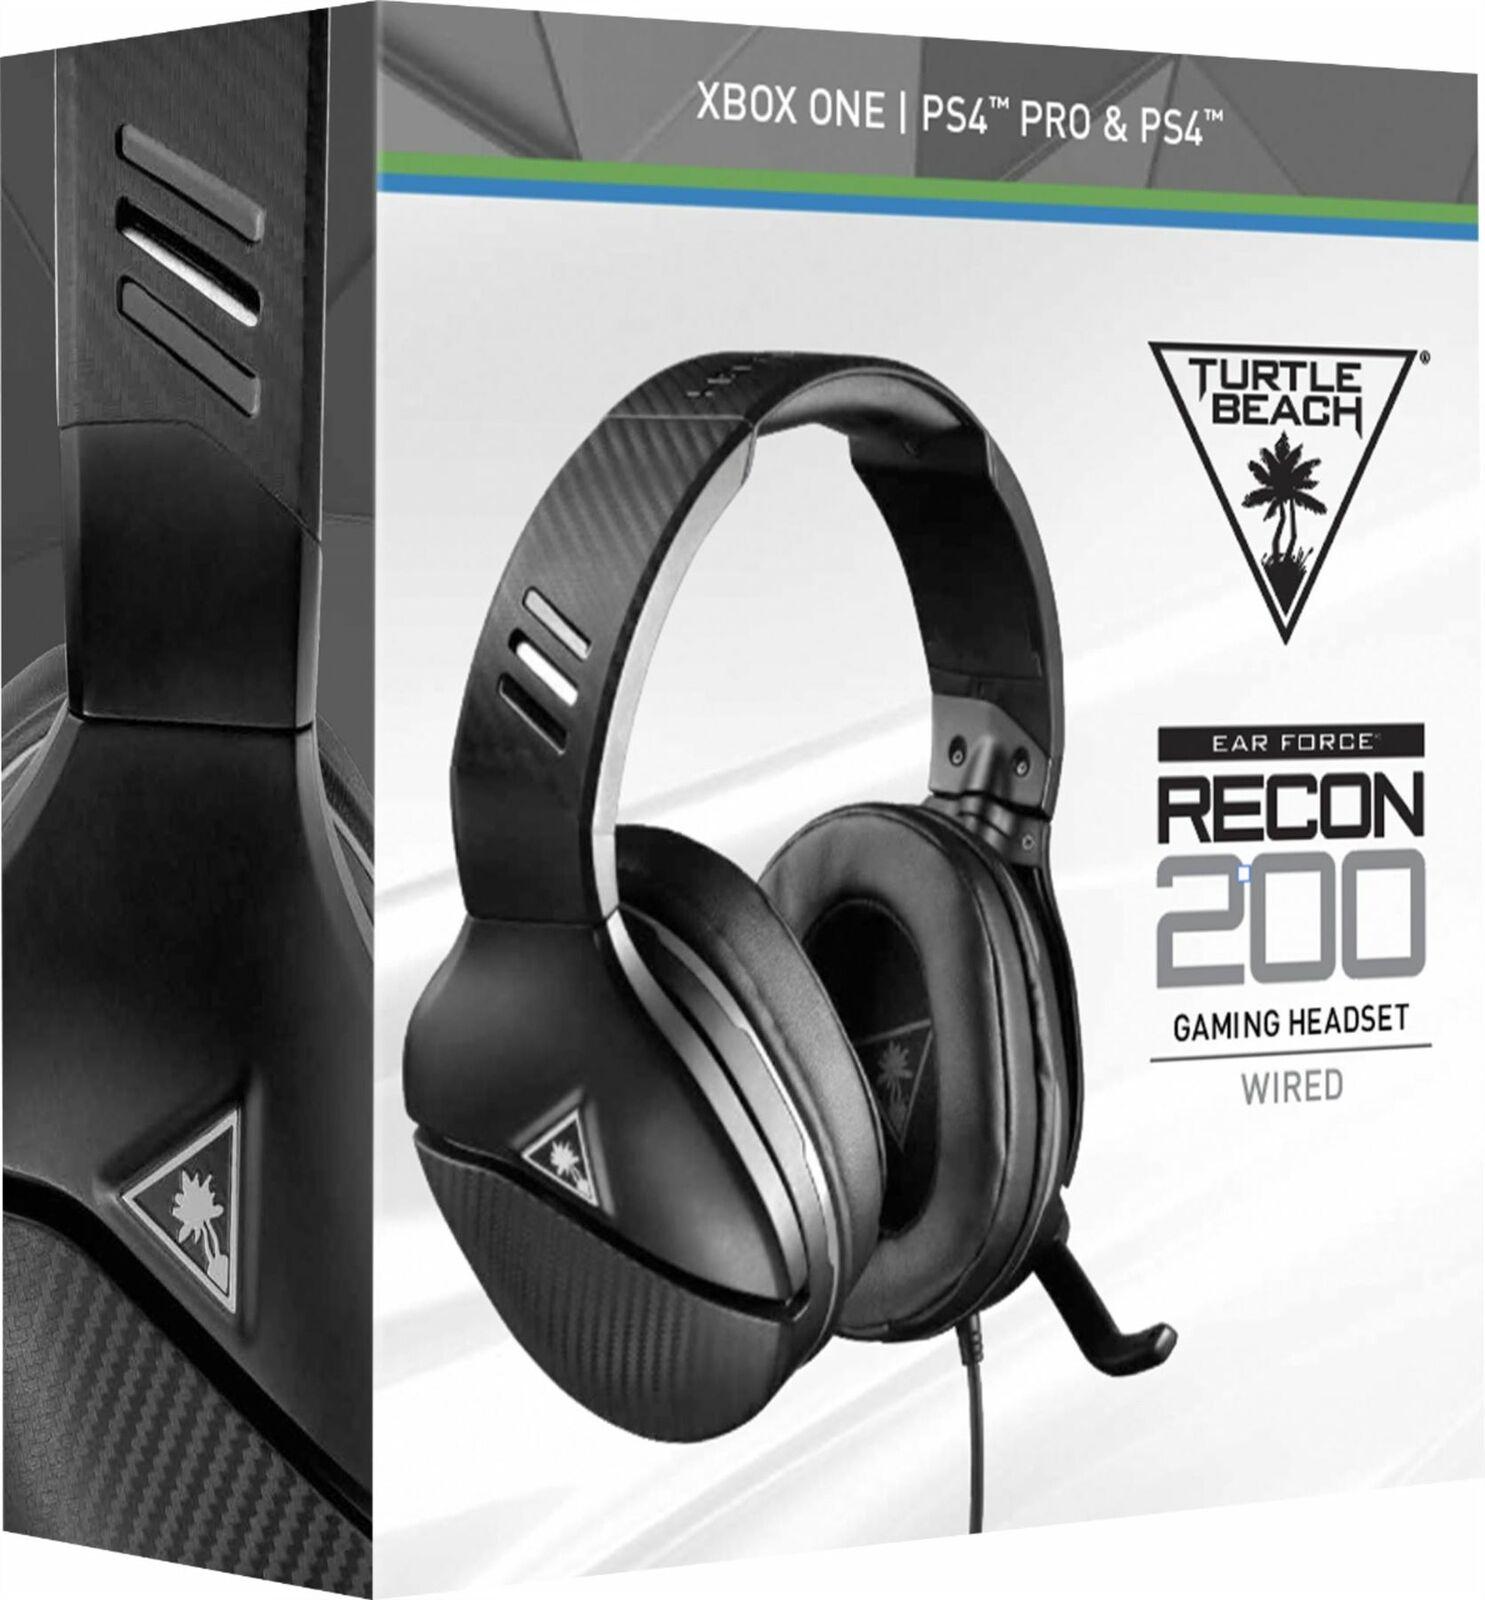 63263ecdd3c Turtle Beach Recon 200 Multi Platform Gaming Headset - Black for sale  online | eBay